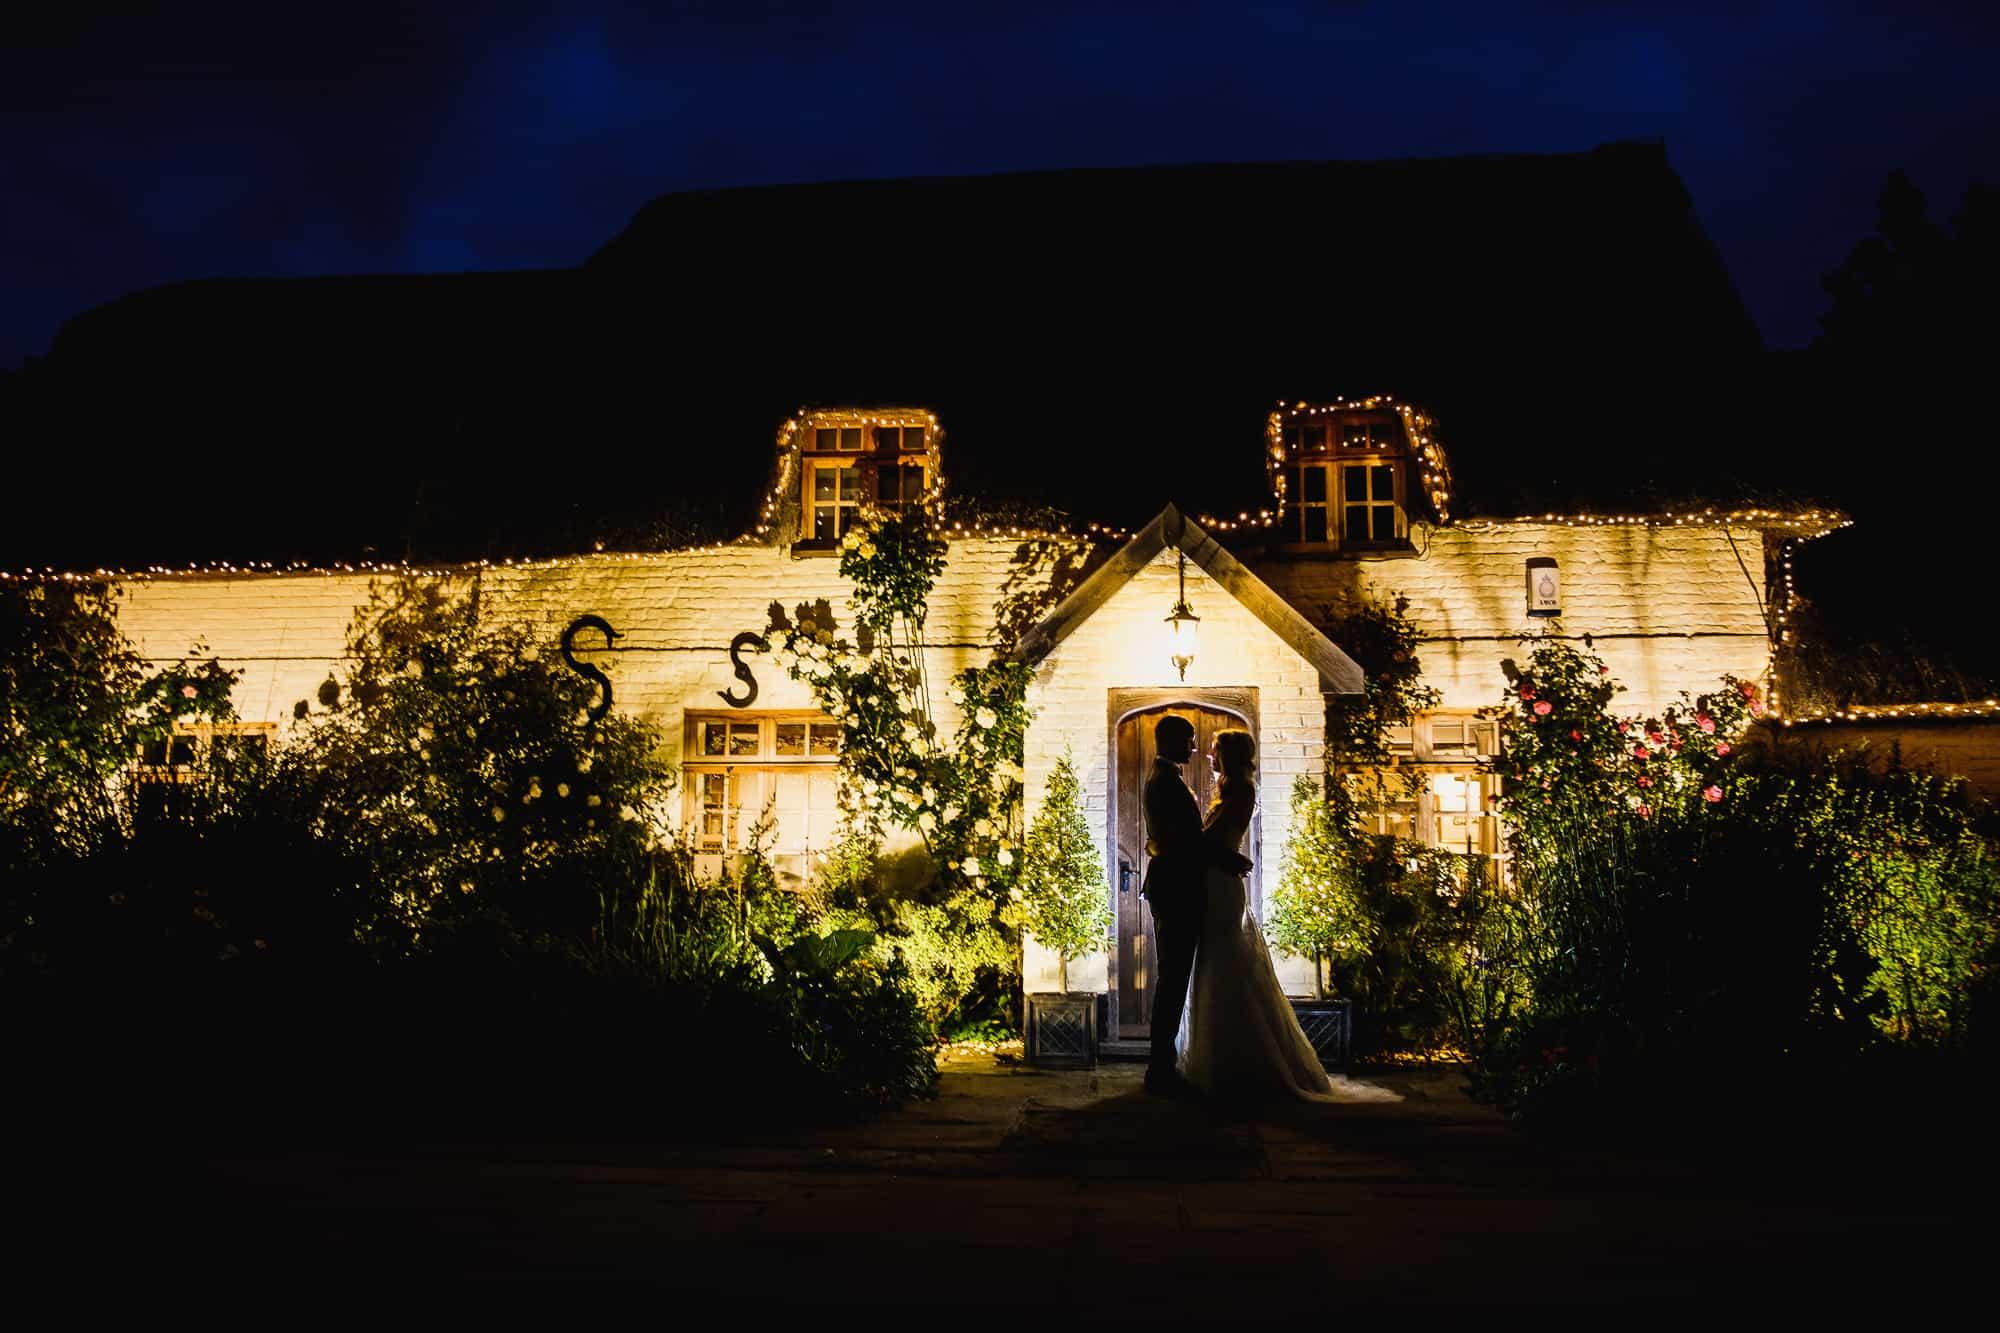 marleybrook-house-wedding-photography-matt-tyler-0069